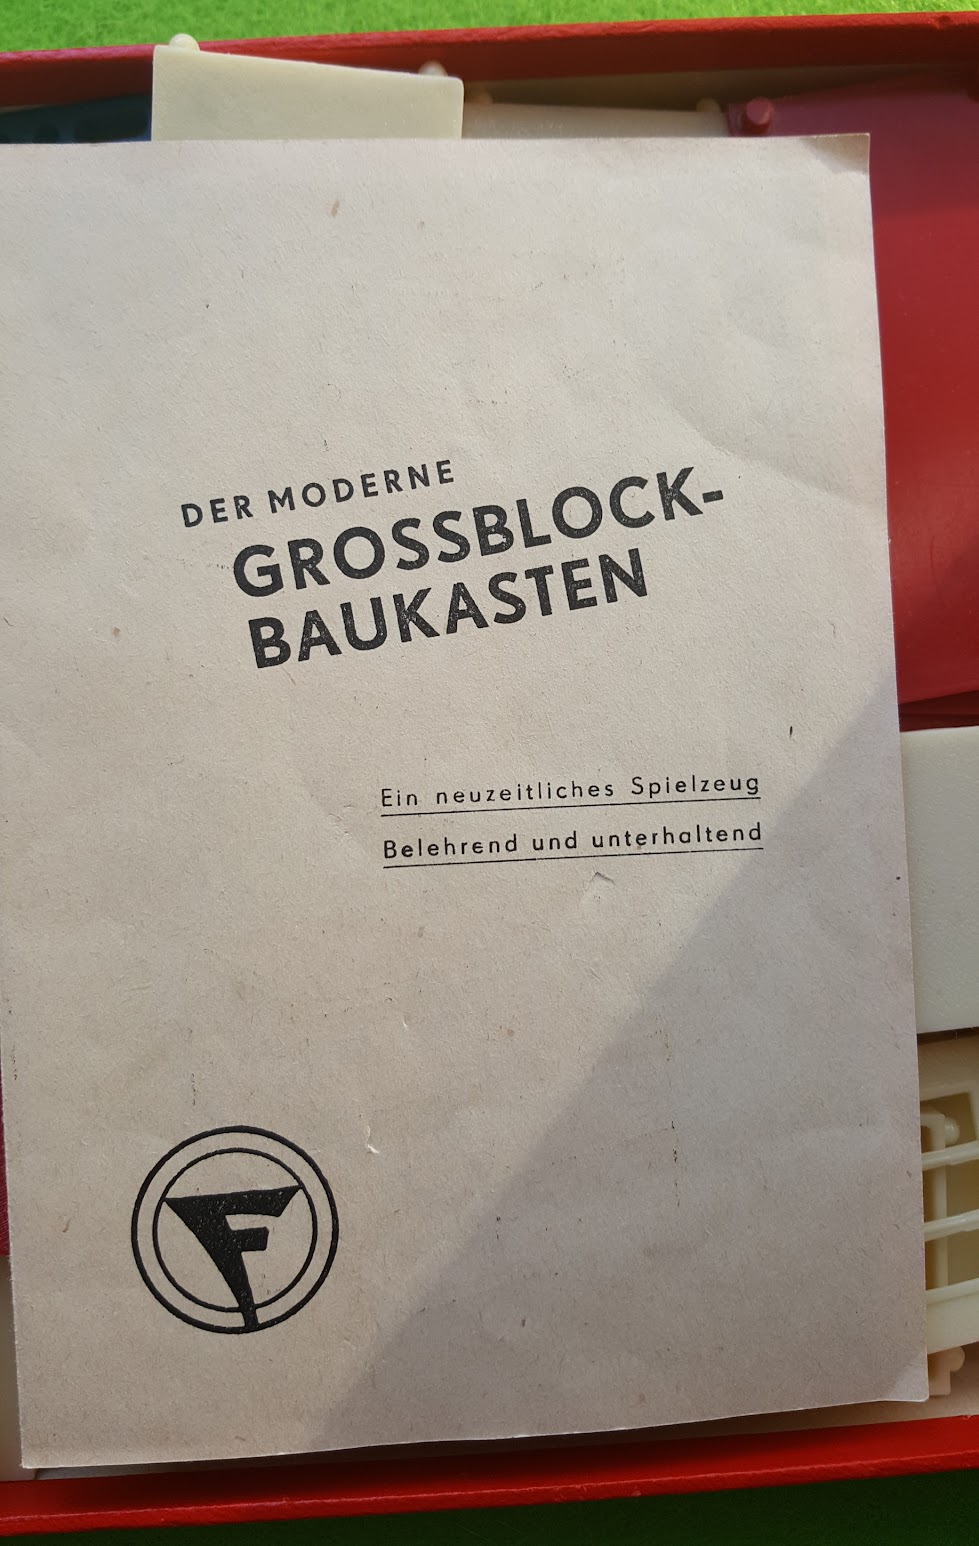 Grossblock-Baukasten